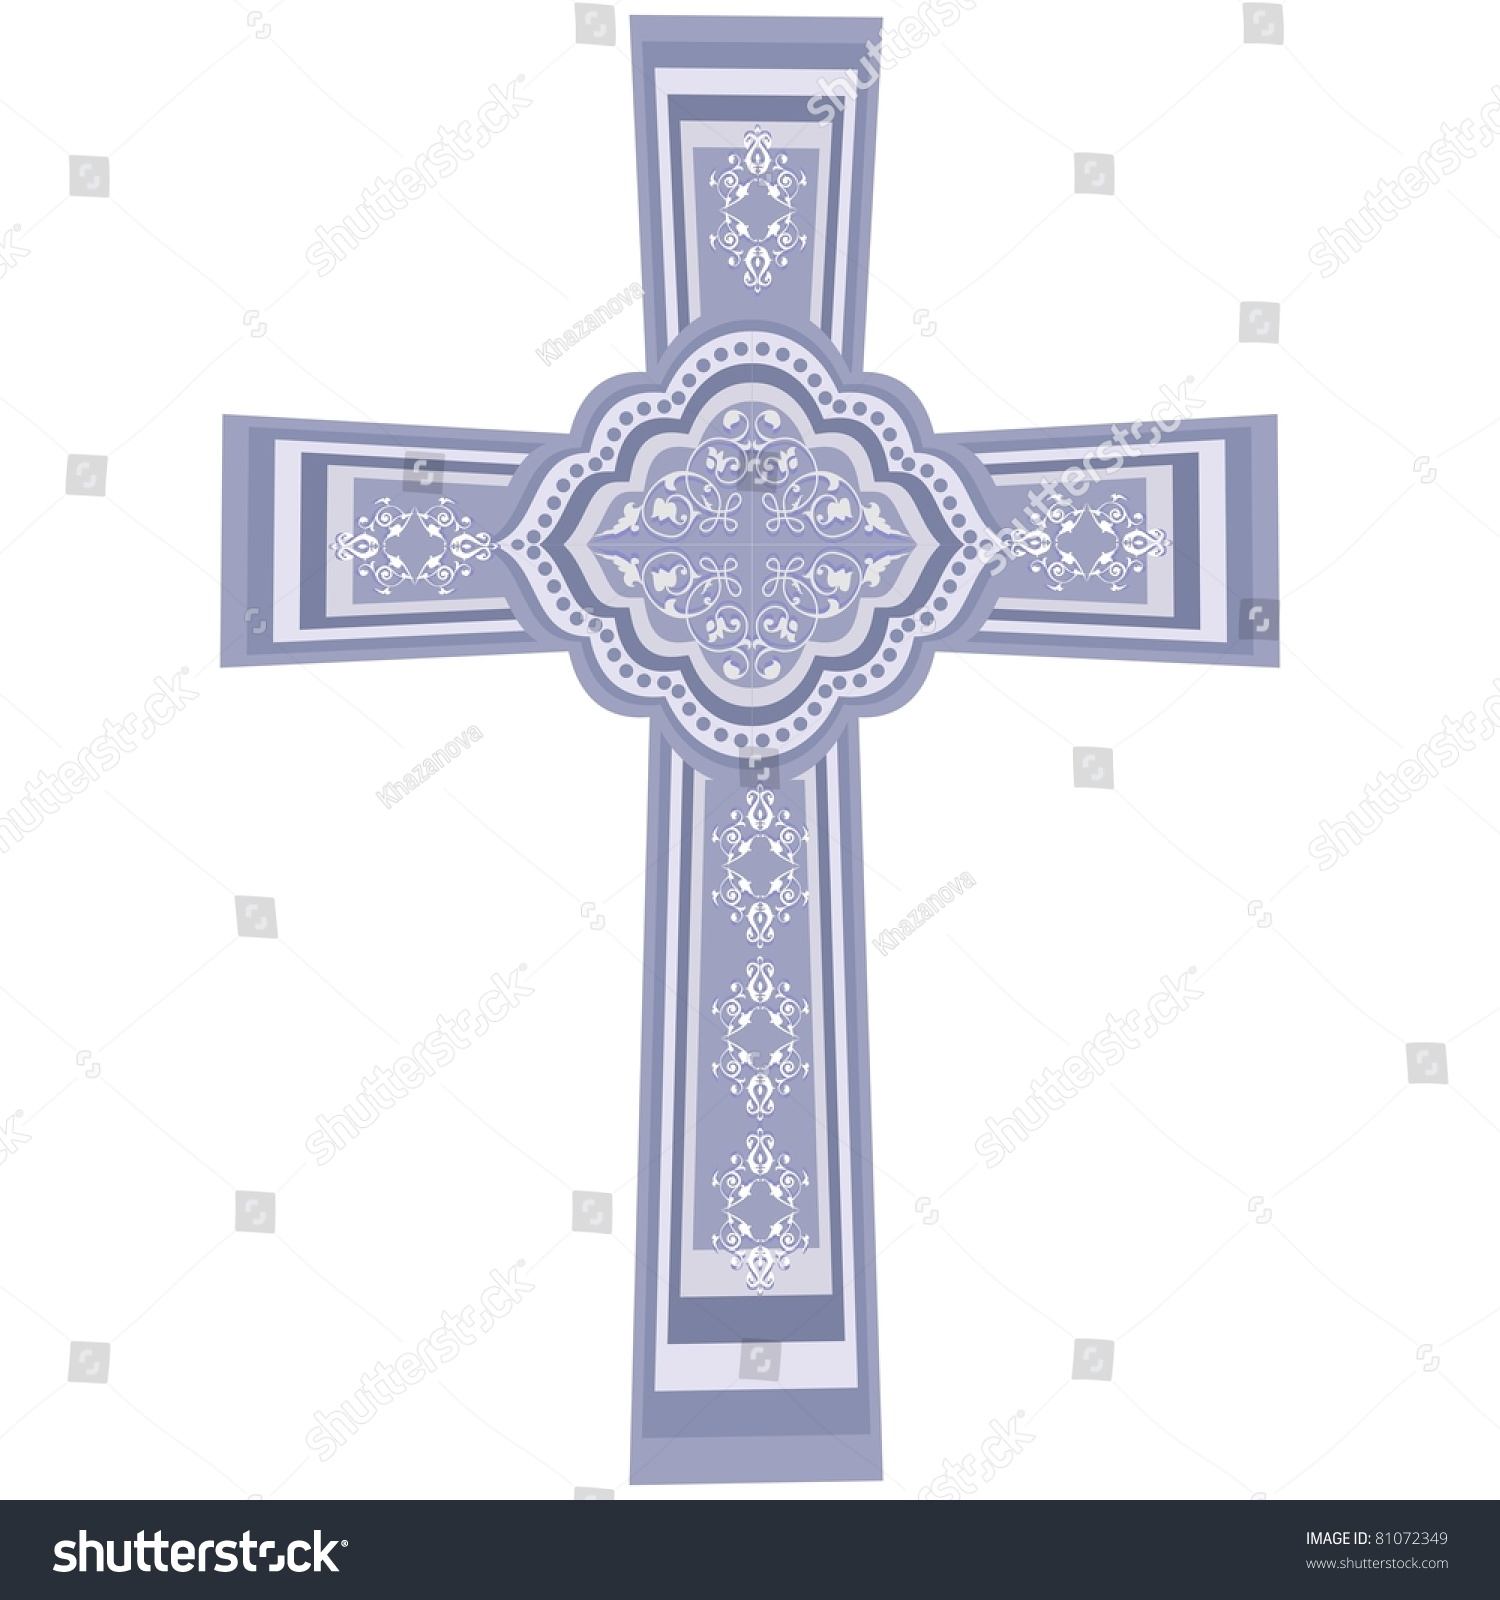 Vector christian cross crucifix symbol christian stock vector vector christian cross crucifix symbol of the christian faith eps8 organized in biocorpaavc Gallery